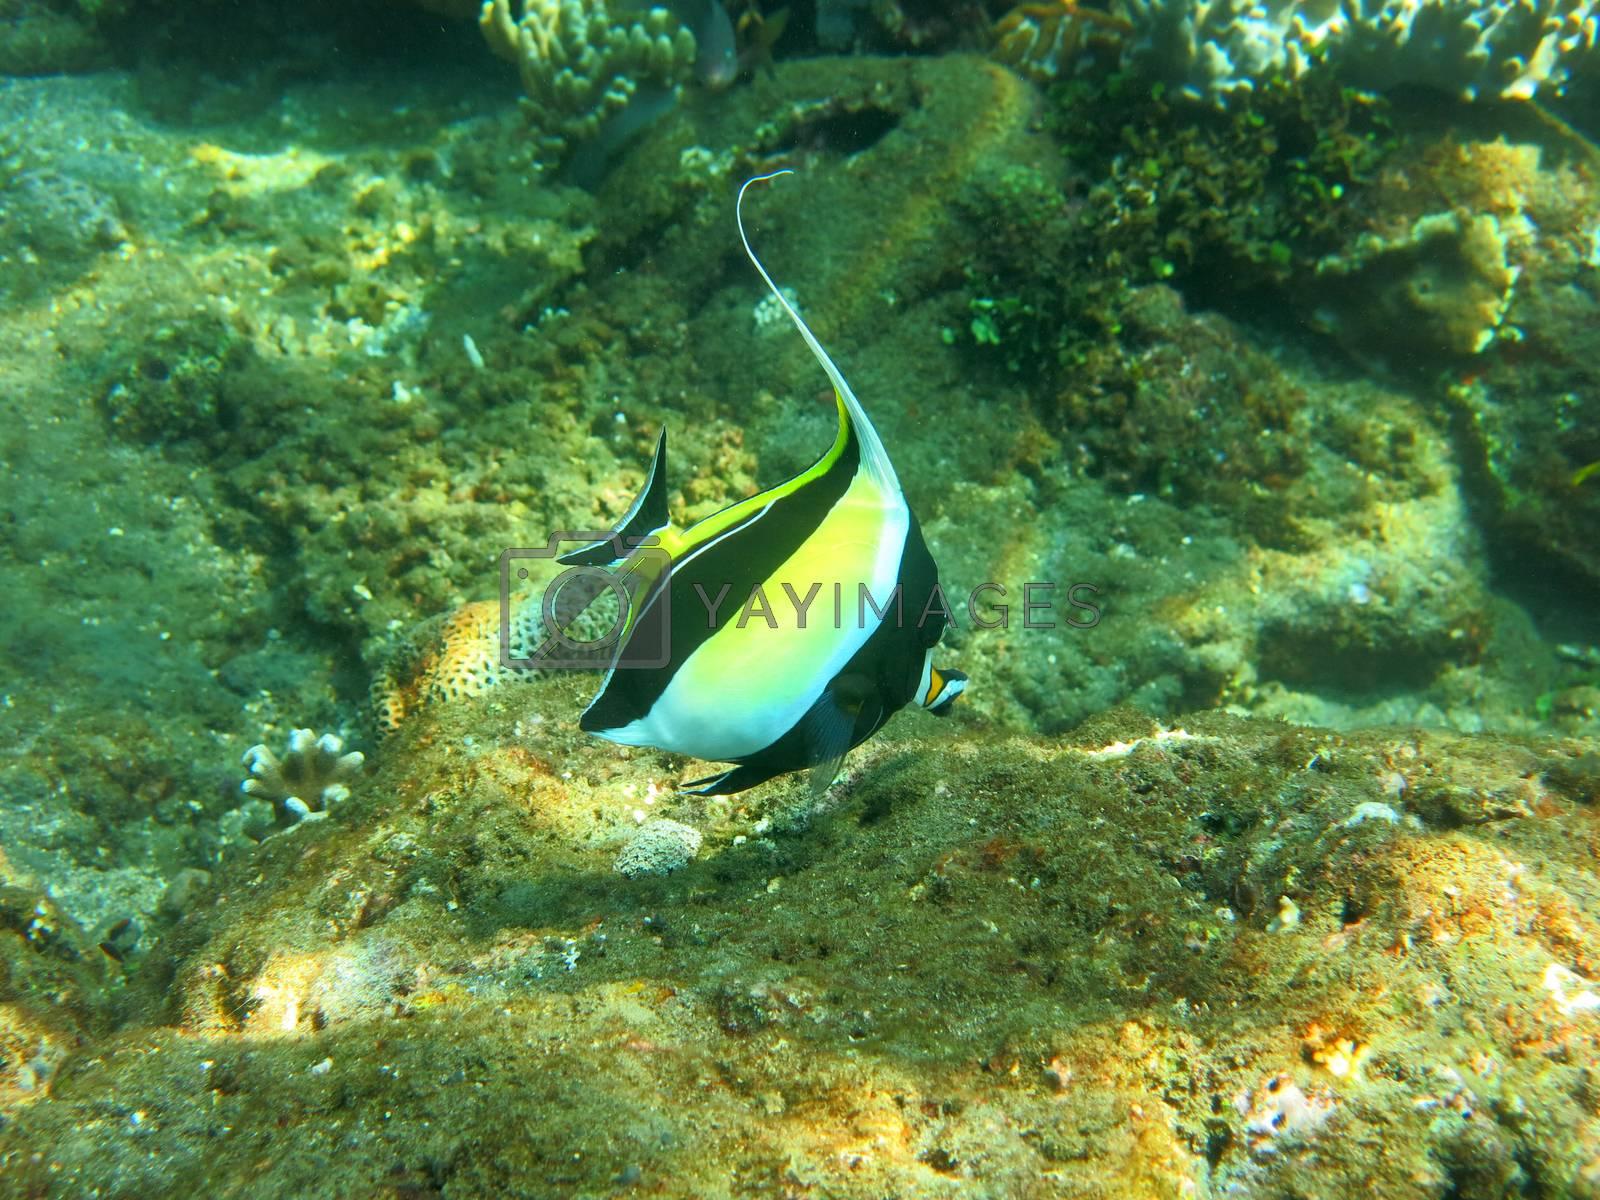 Thriving  coral reef alive with marine life and  tropical fish (Moorish Idols), Bali.